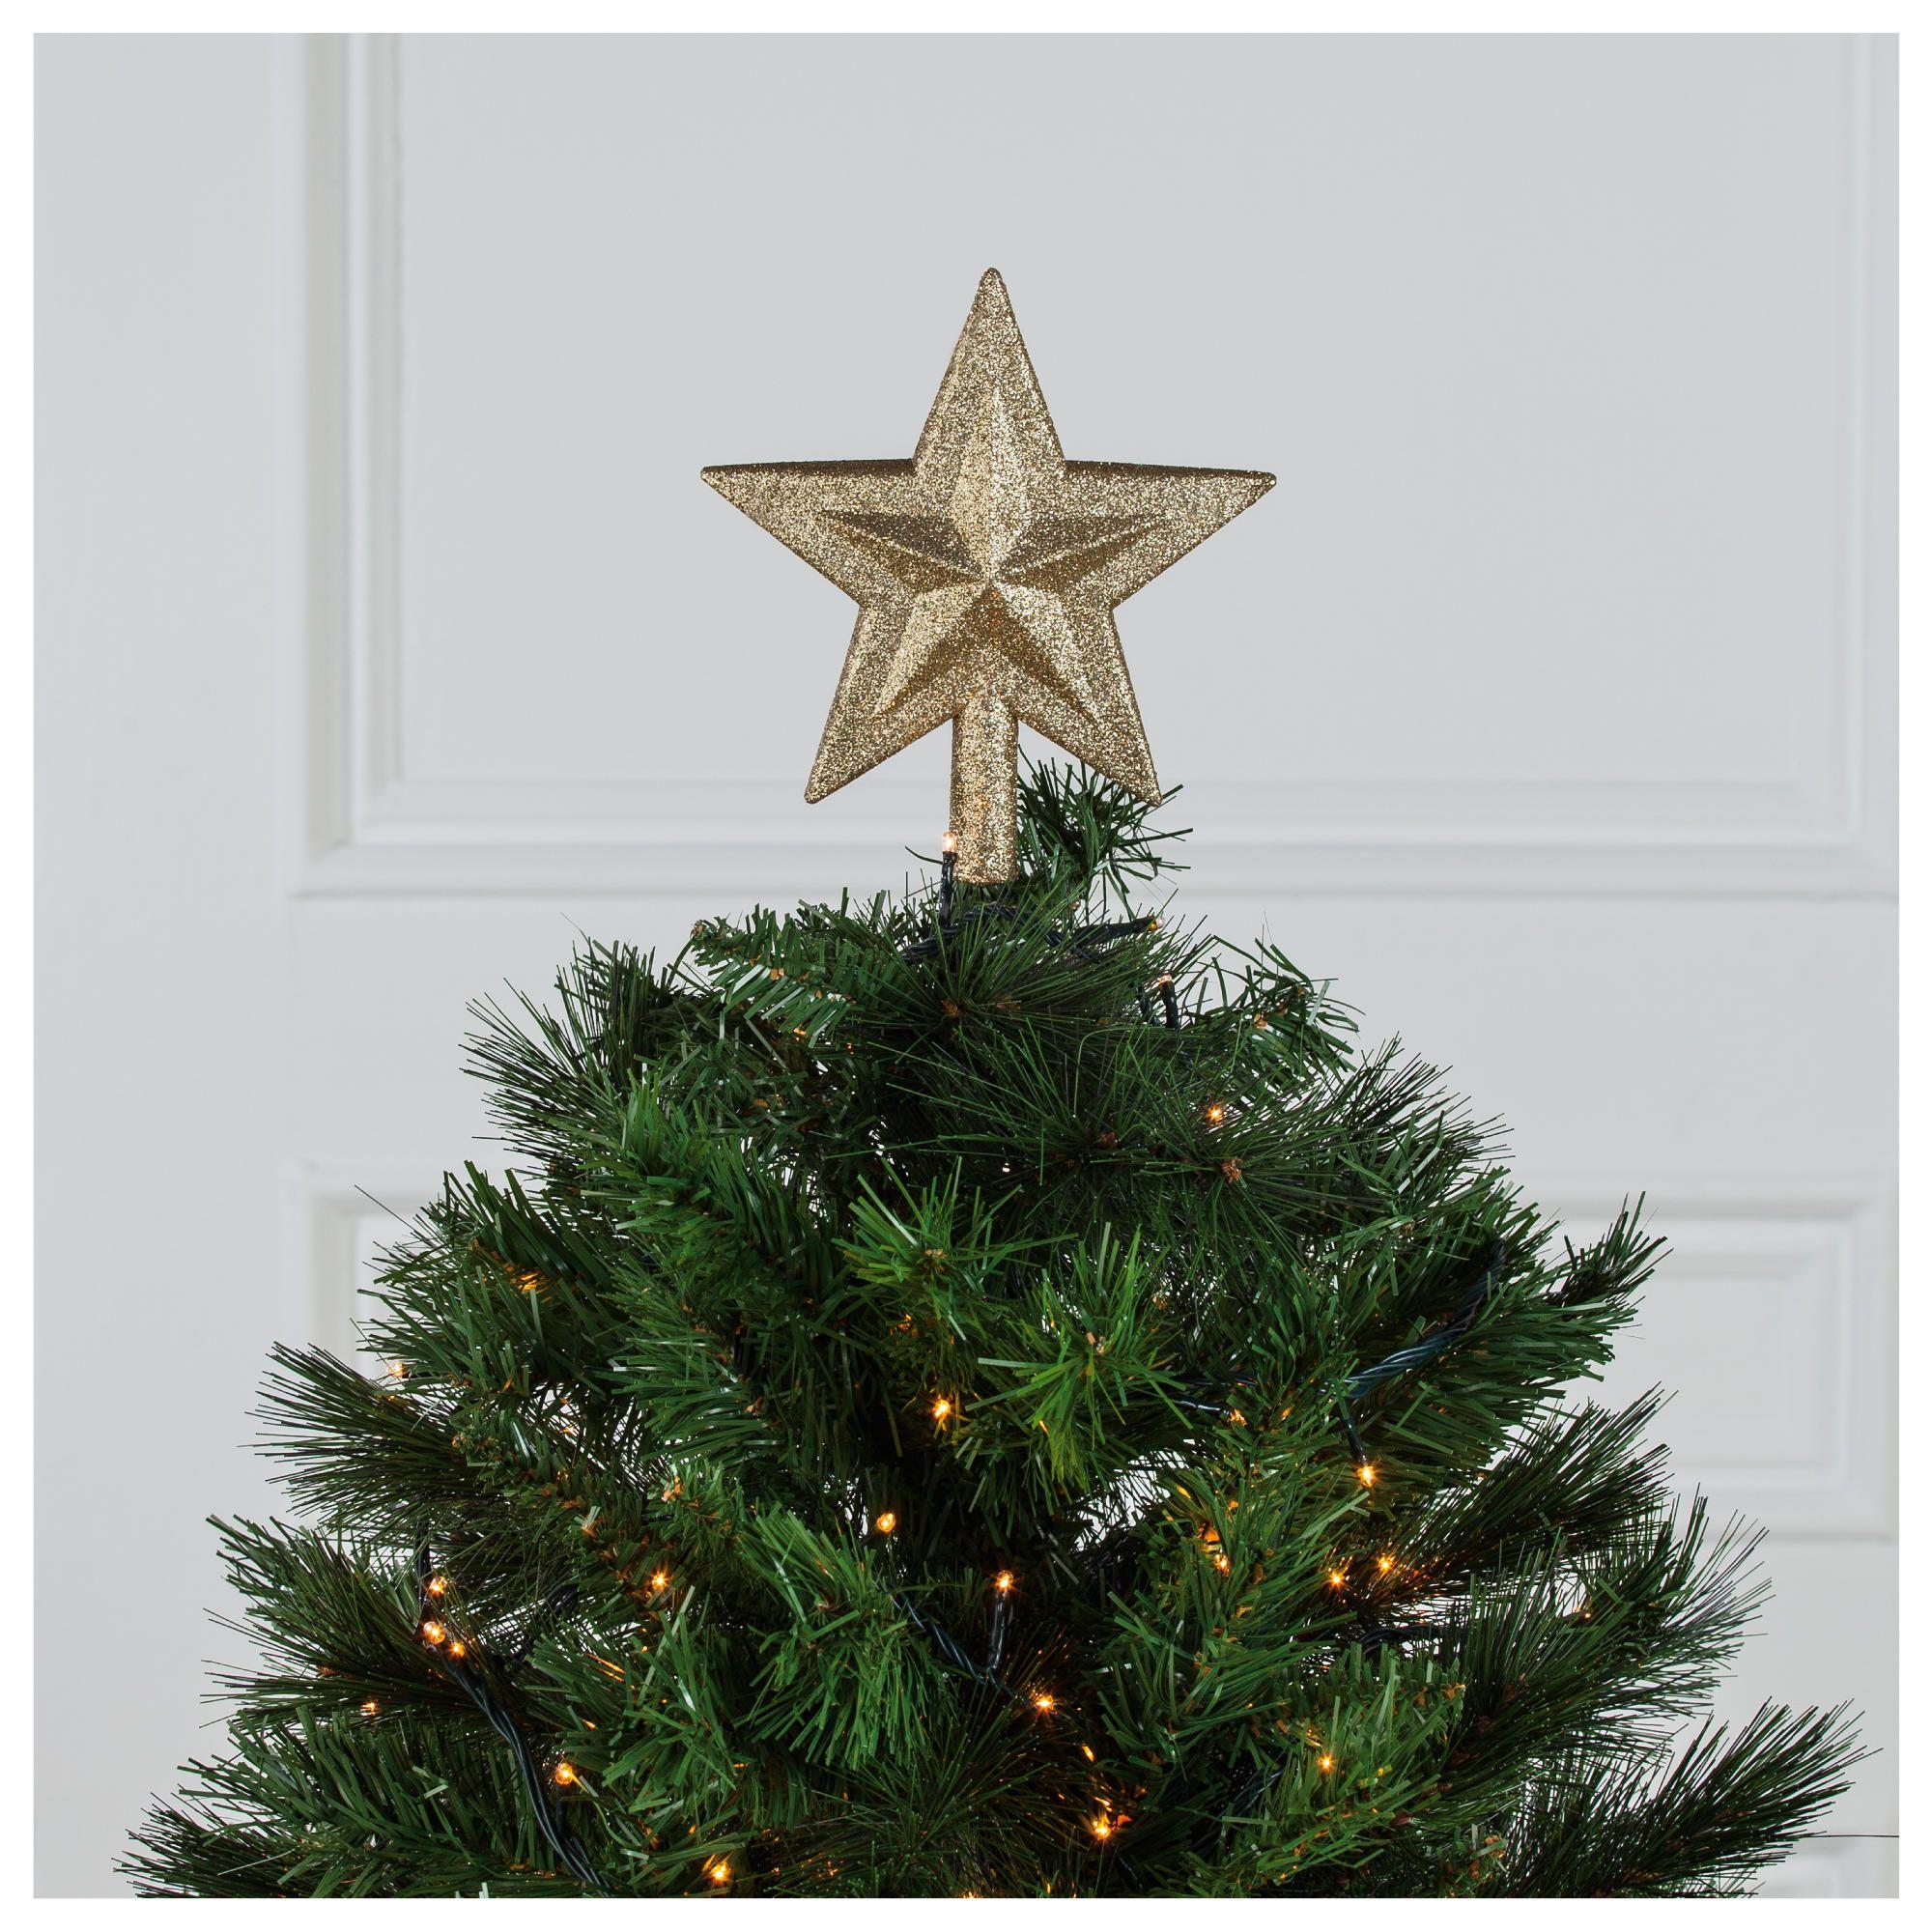 Christmas Tree With Lights Tesco: Myshop